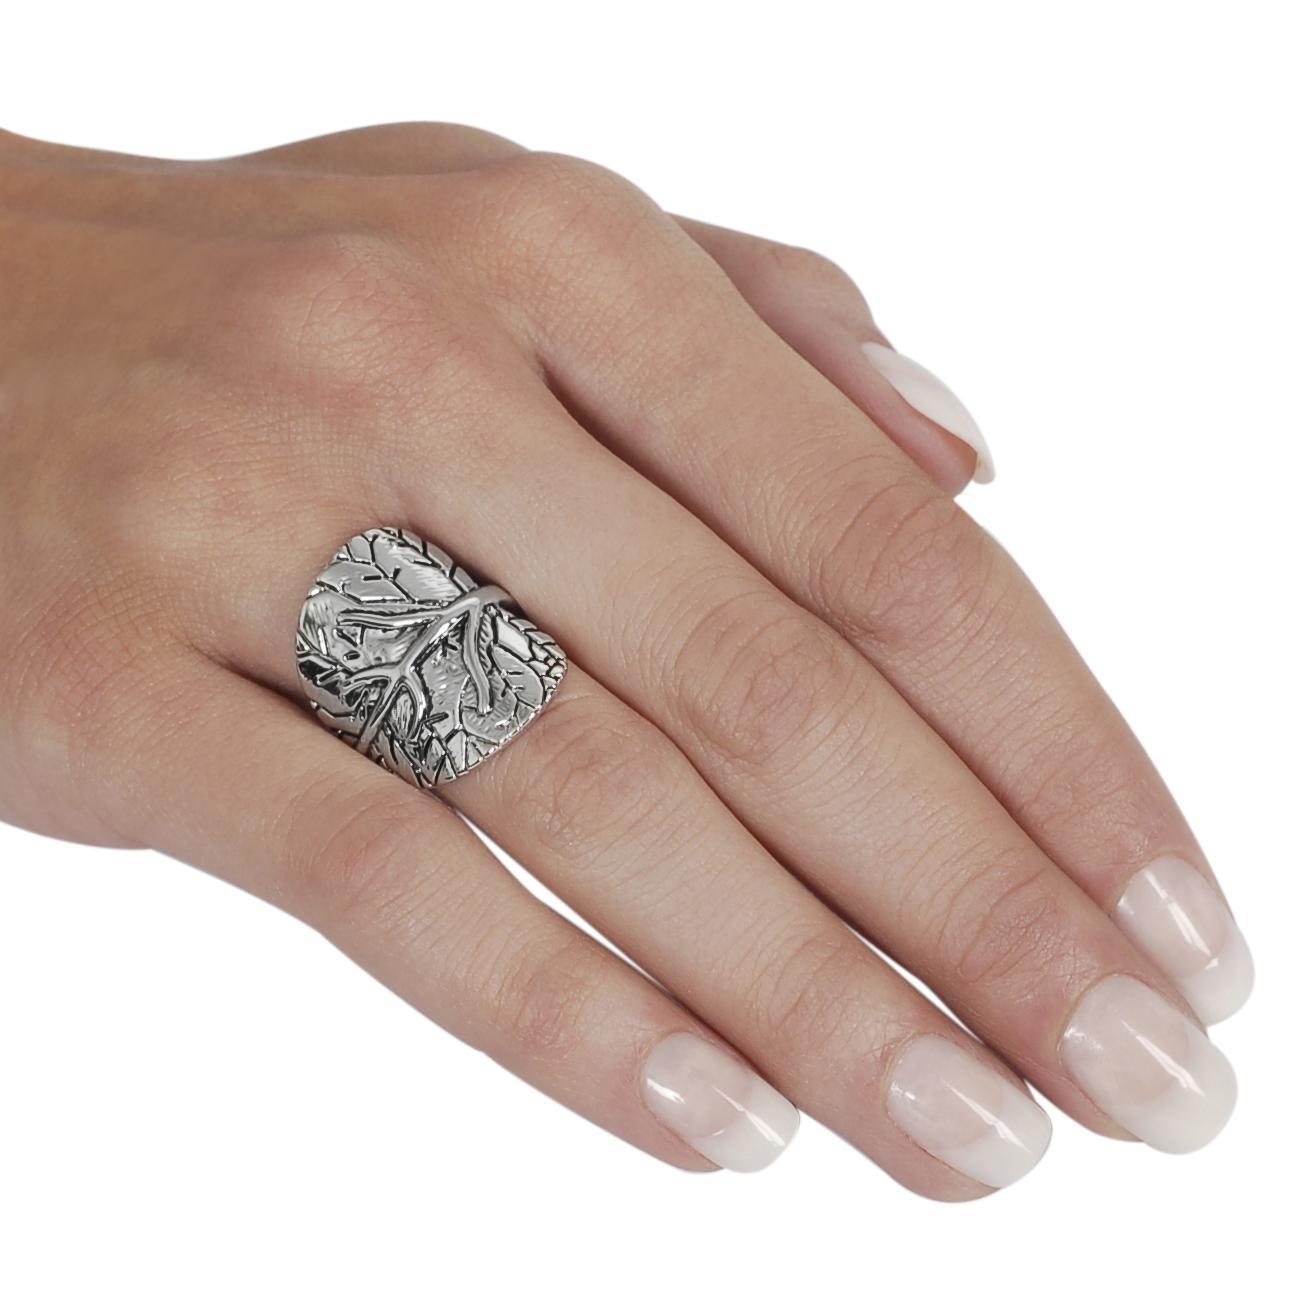 Silvertone Tree Design Ring - Thumbnail 2